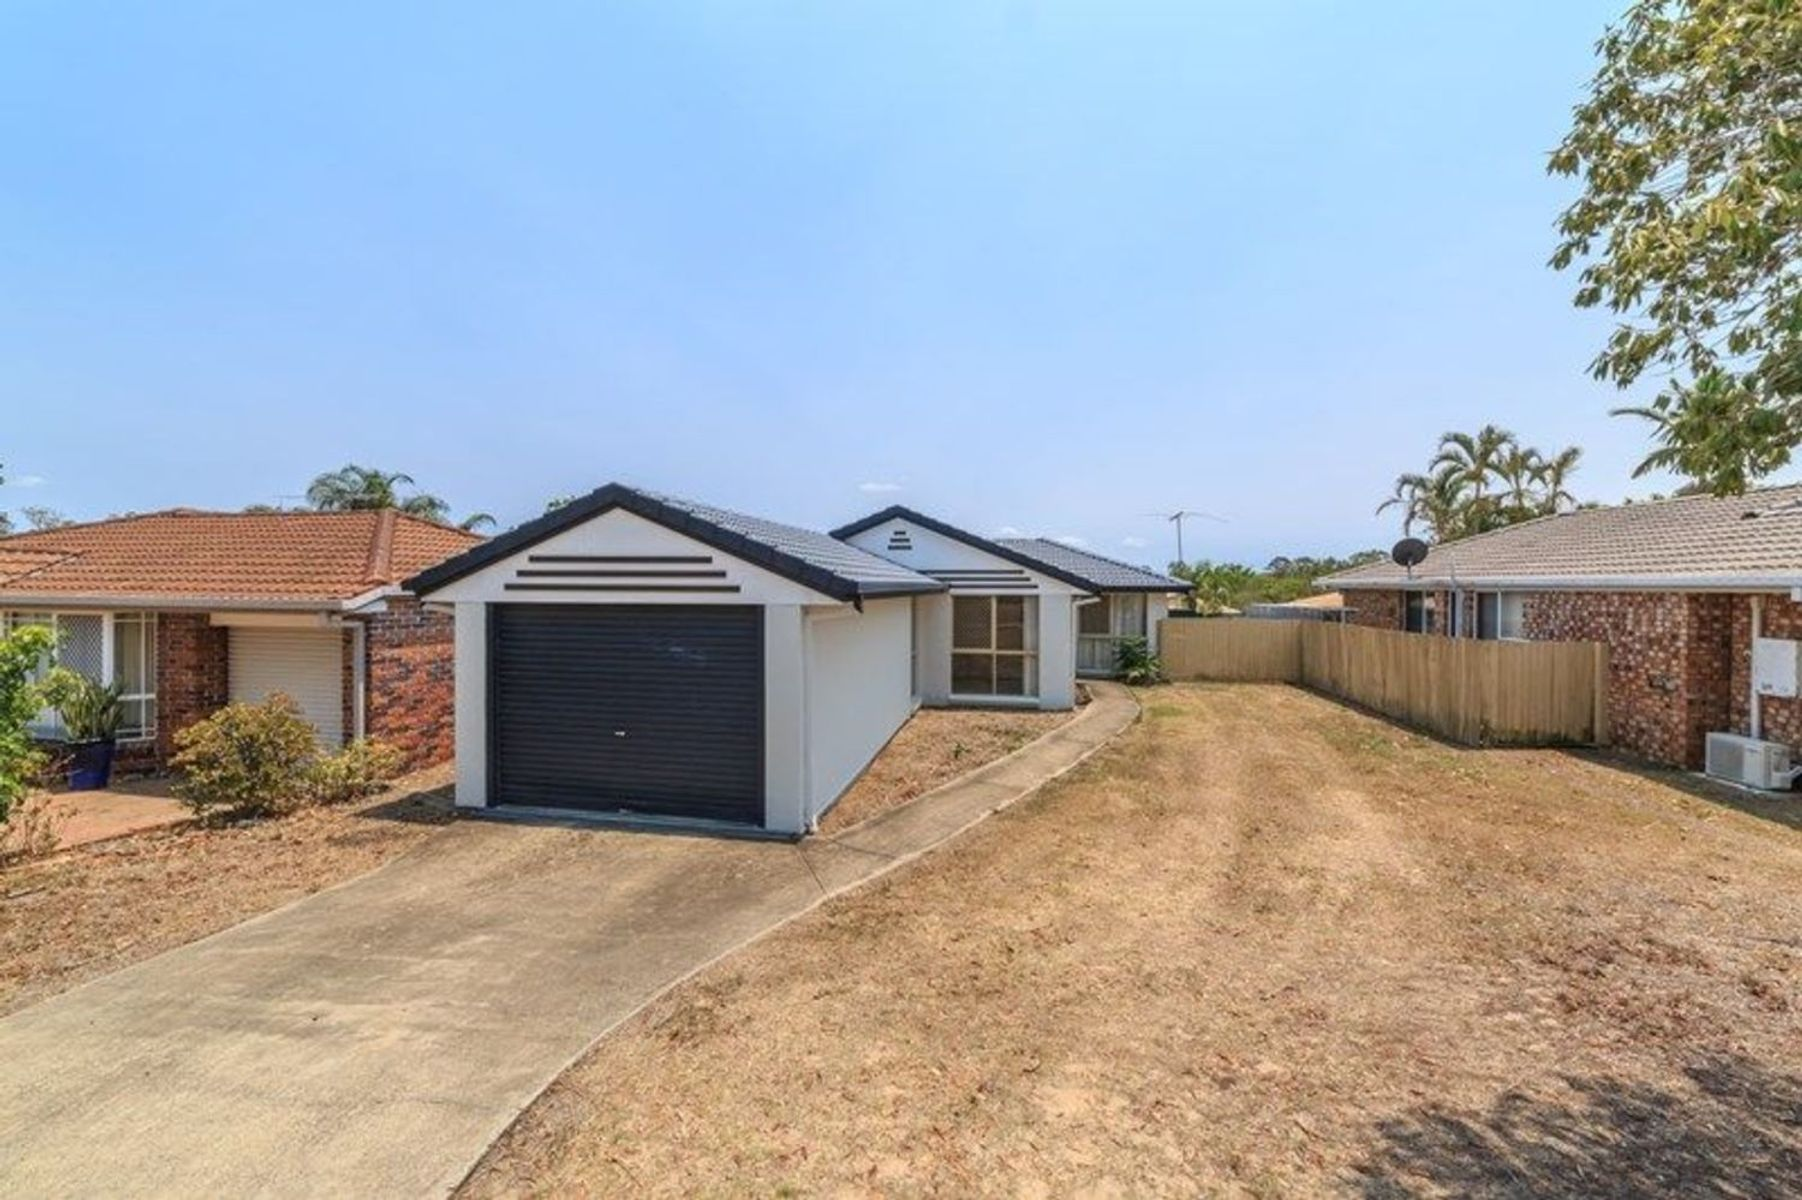 9 Diamantina Street, Hillcrest, QLD 4118